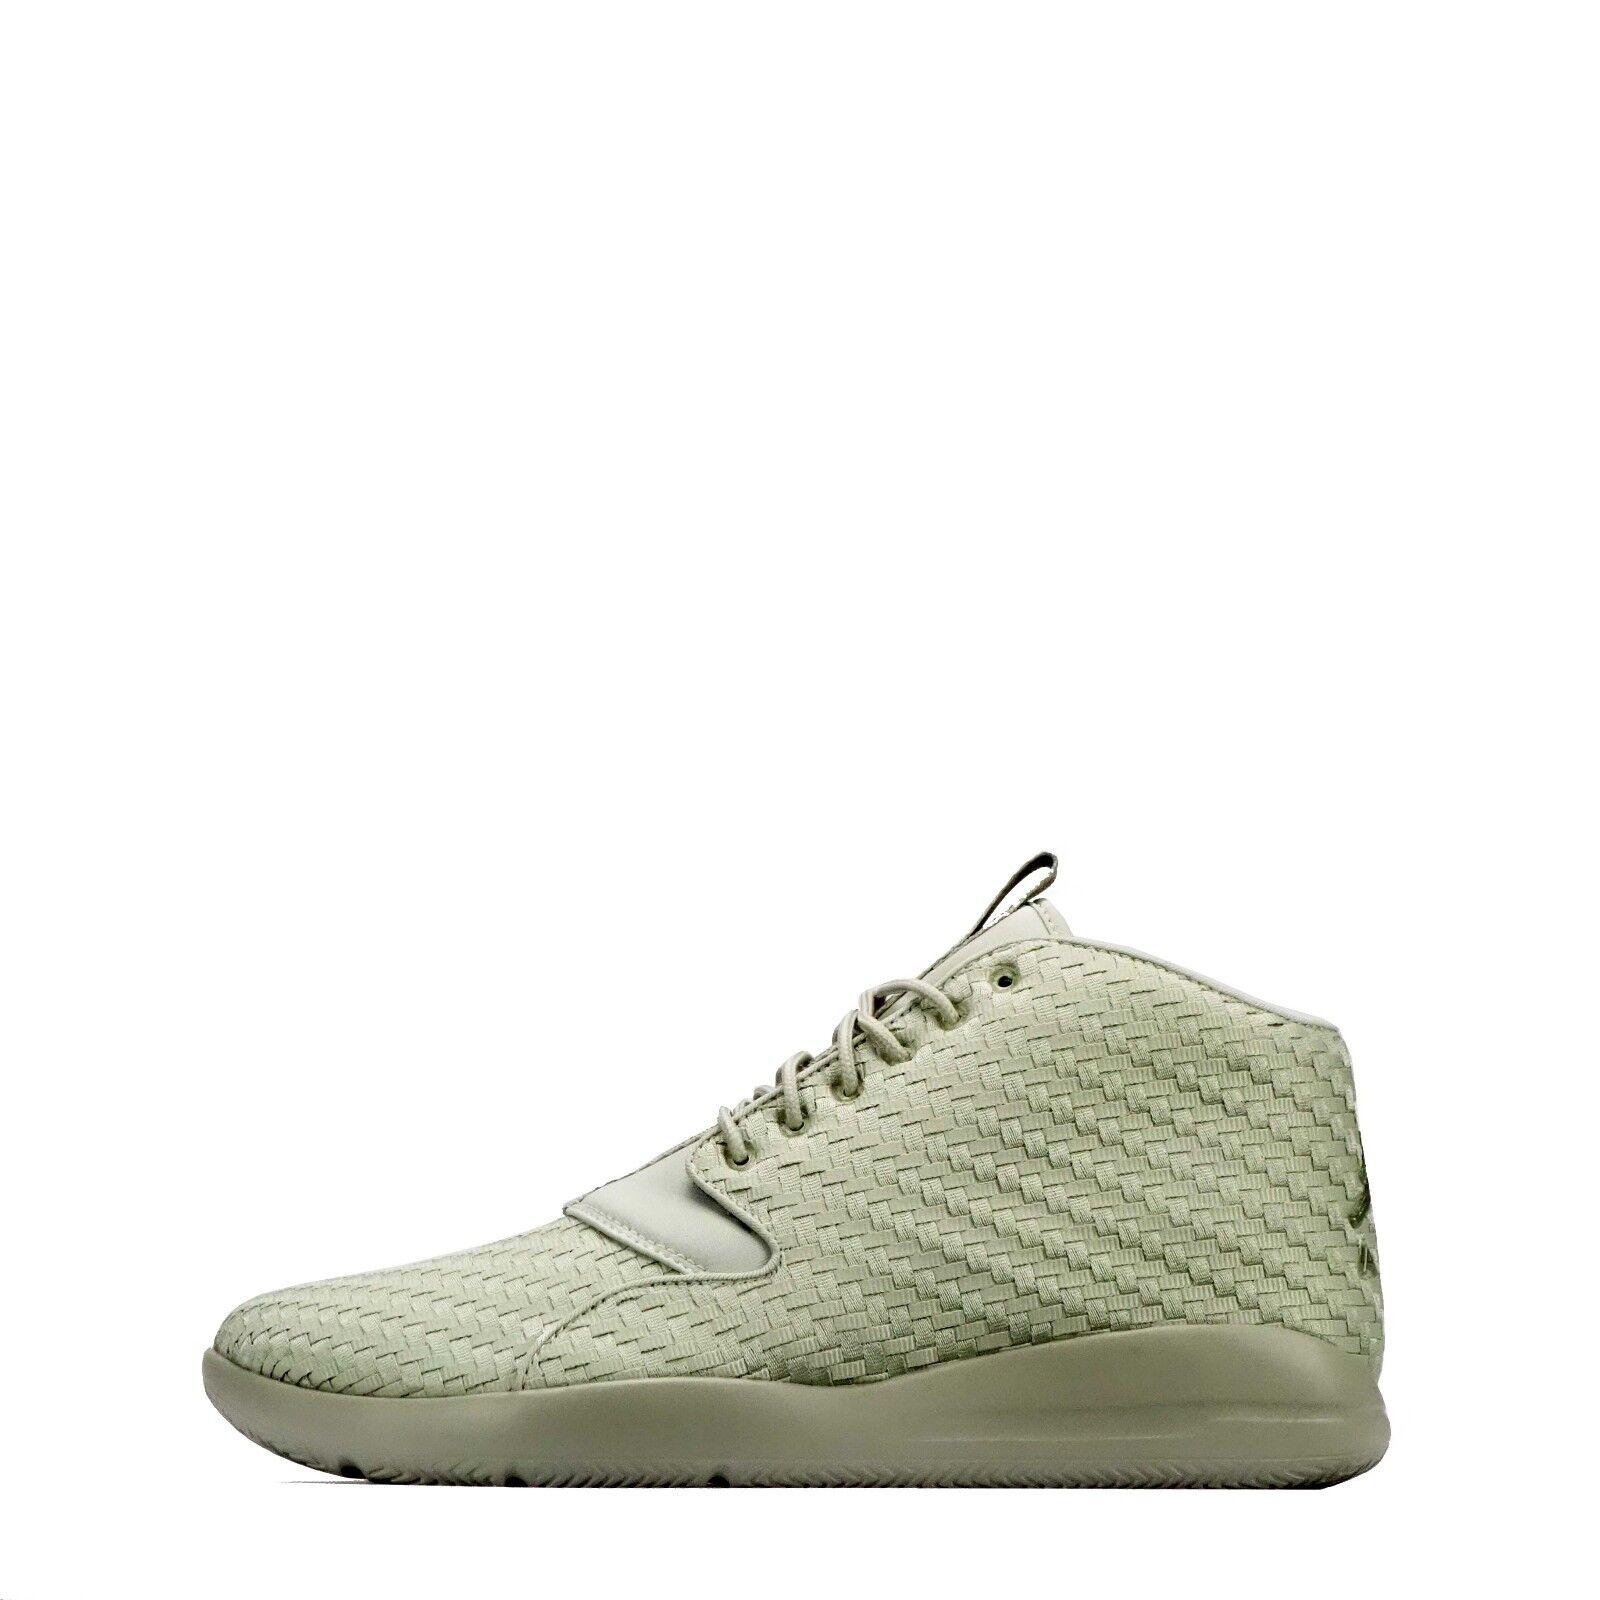 Nike Jordan Eclipse Chukka Hommes Chaussures Light Bone/Beige